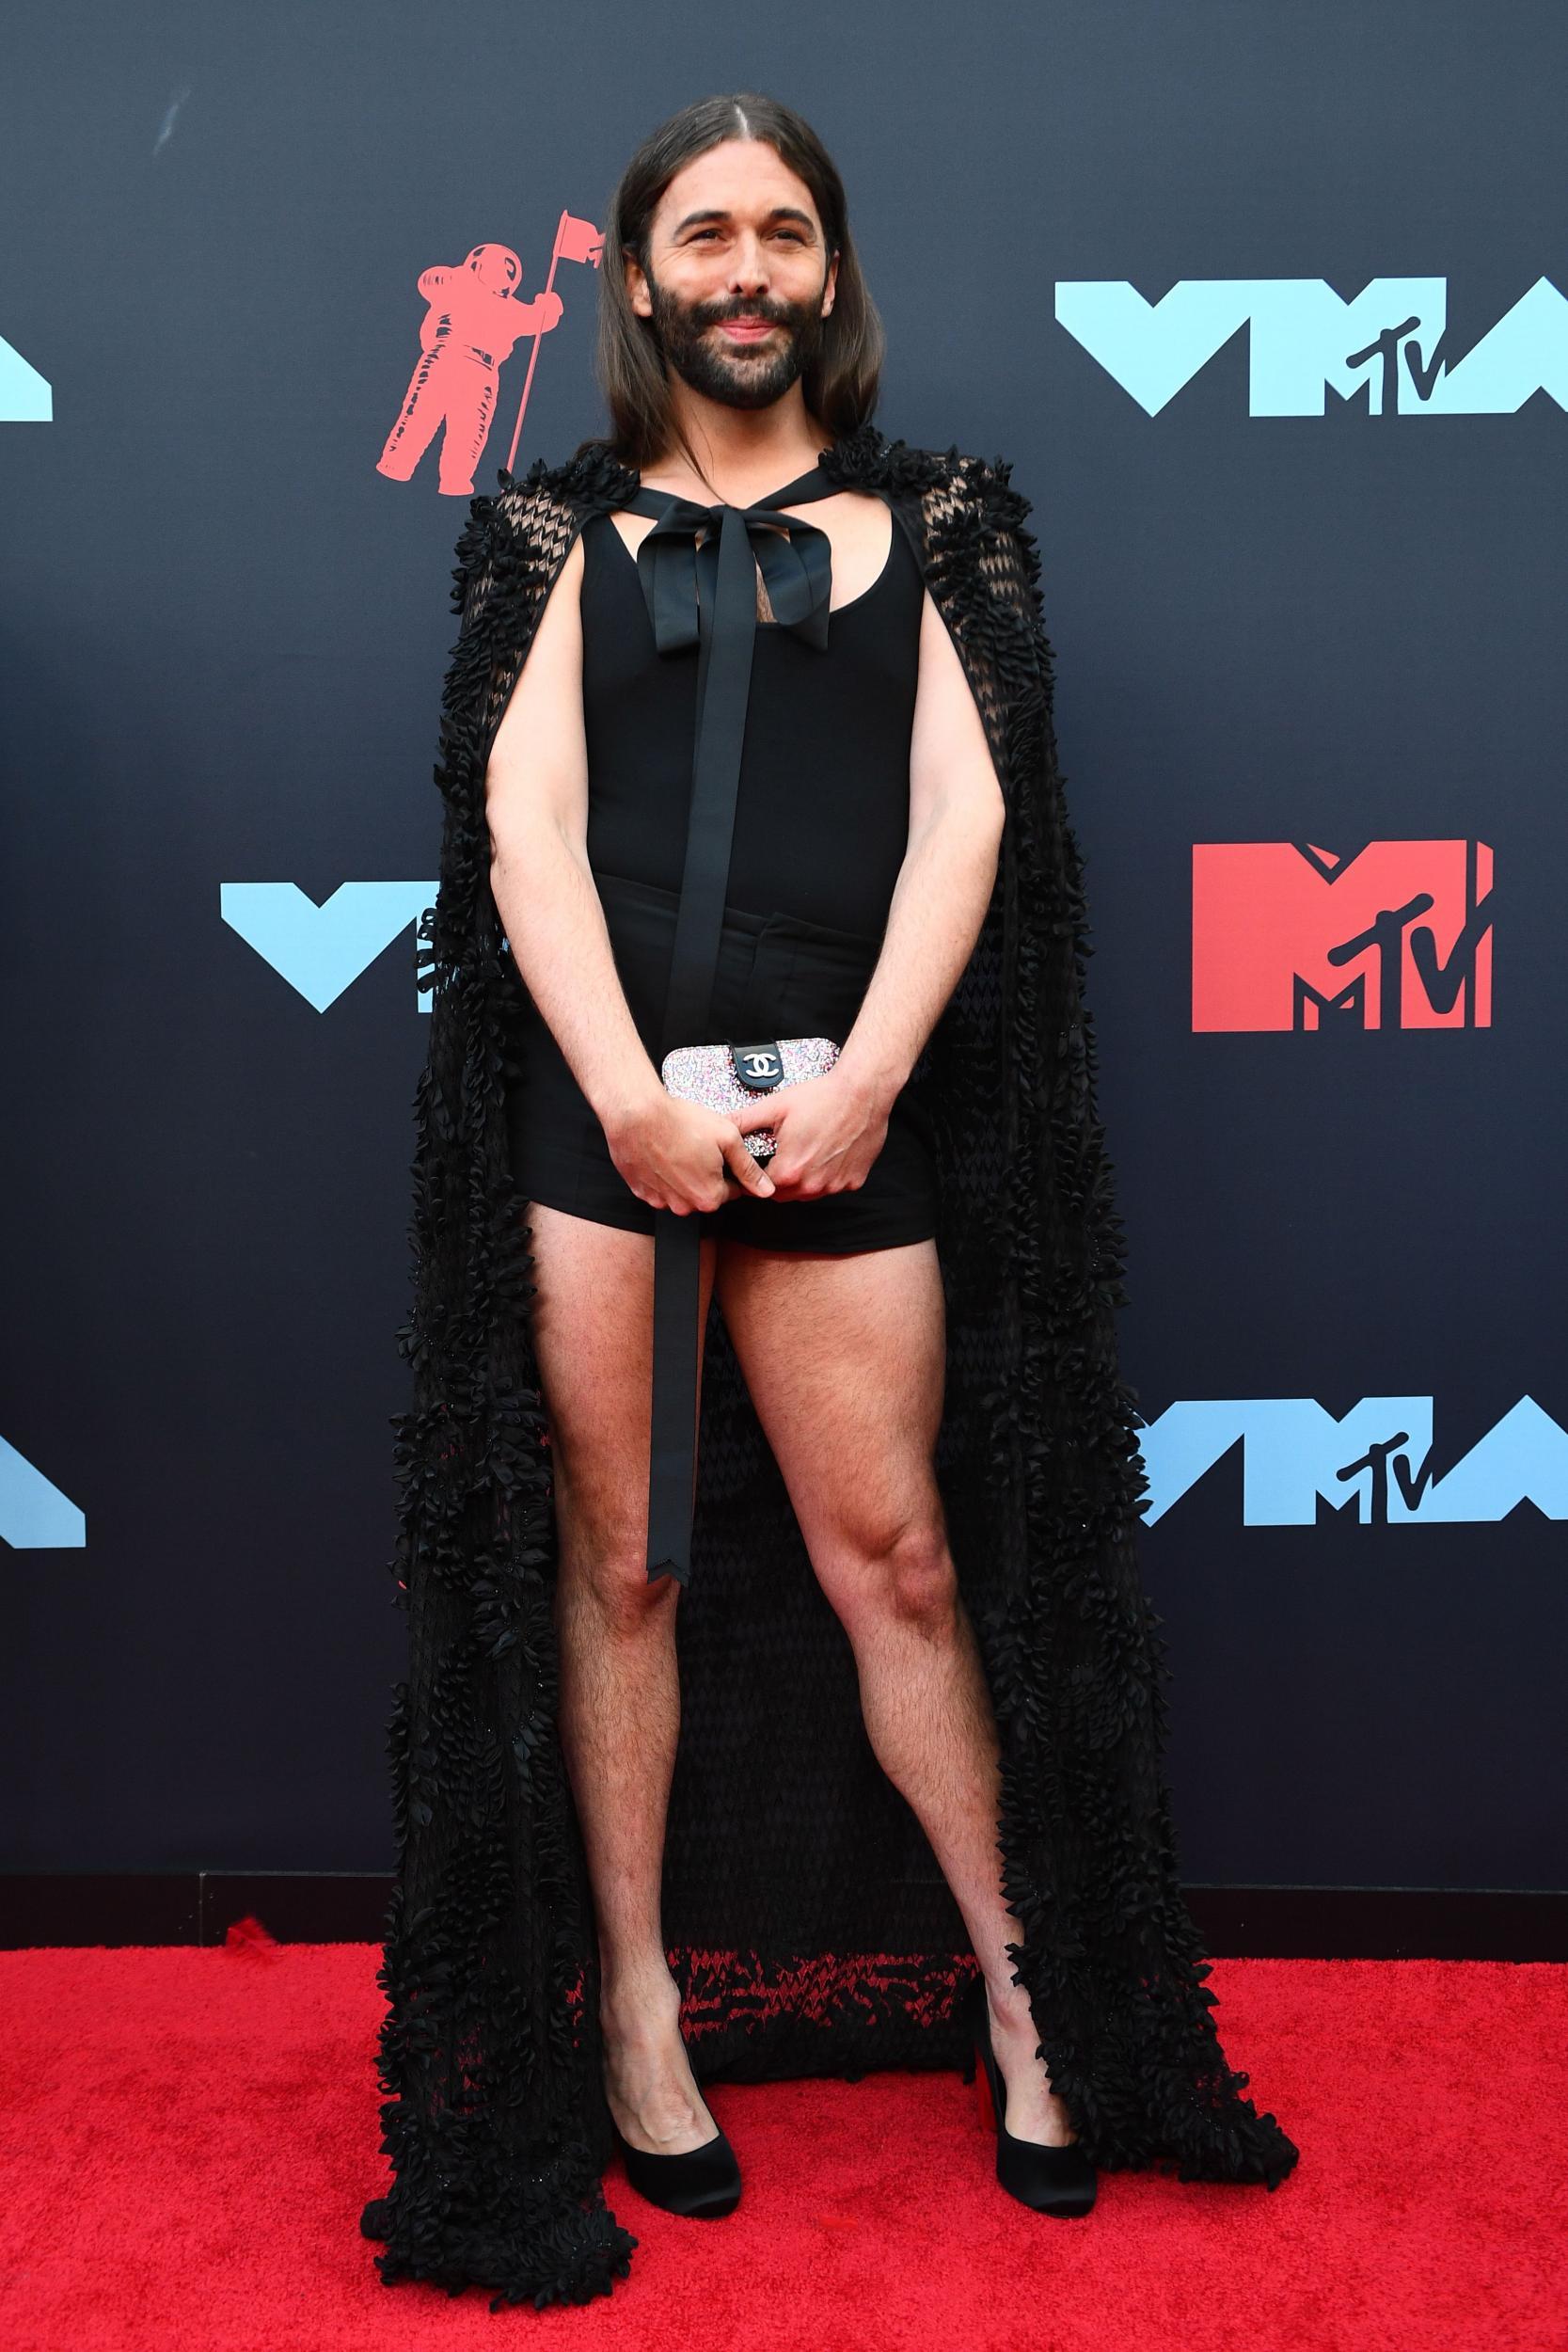 VMAs host Sebastian Maniscalco under fire for joking about